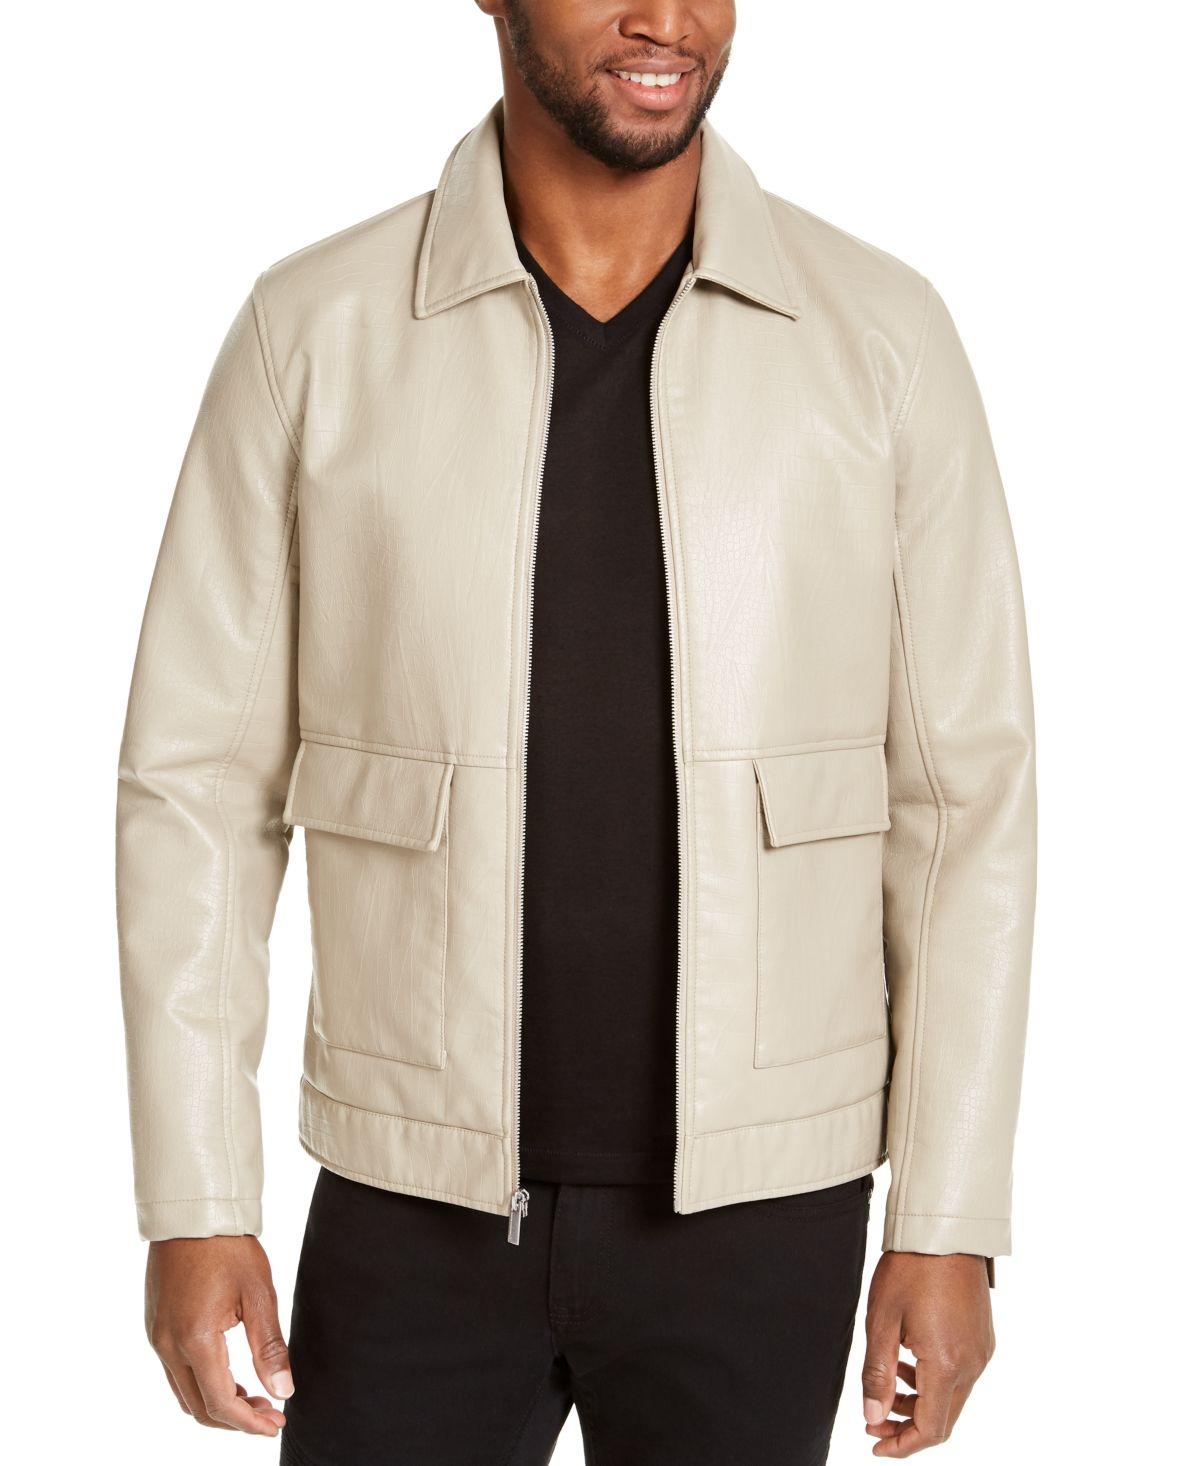 Inc Men S Harrington Faux Leather Embossed Jacket Created For Macy S Walnut Beige Embossed Leather Faux Leather Jackets Faux Leather [ 1466 x 1200 Pixel ]